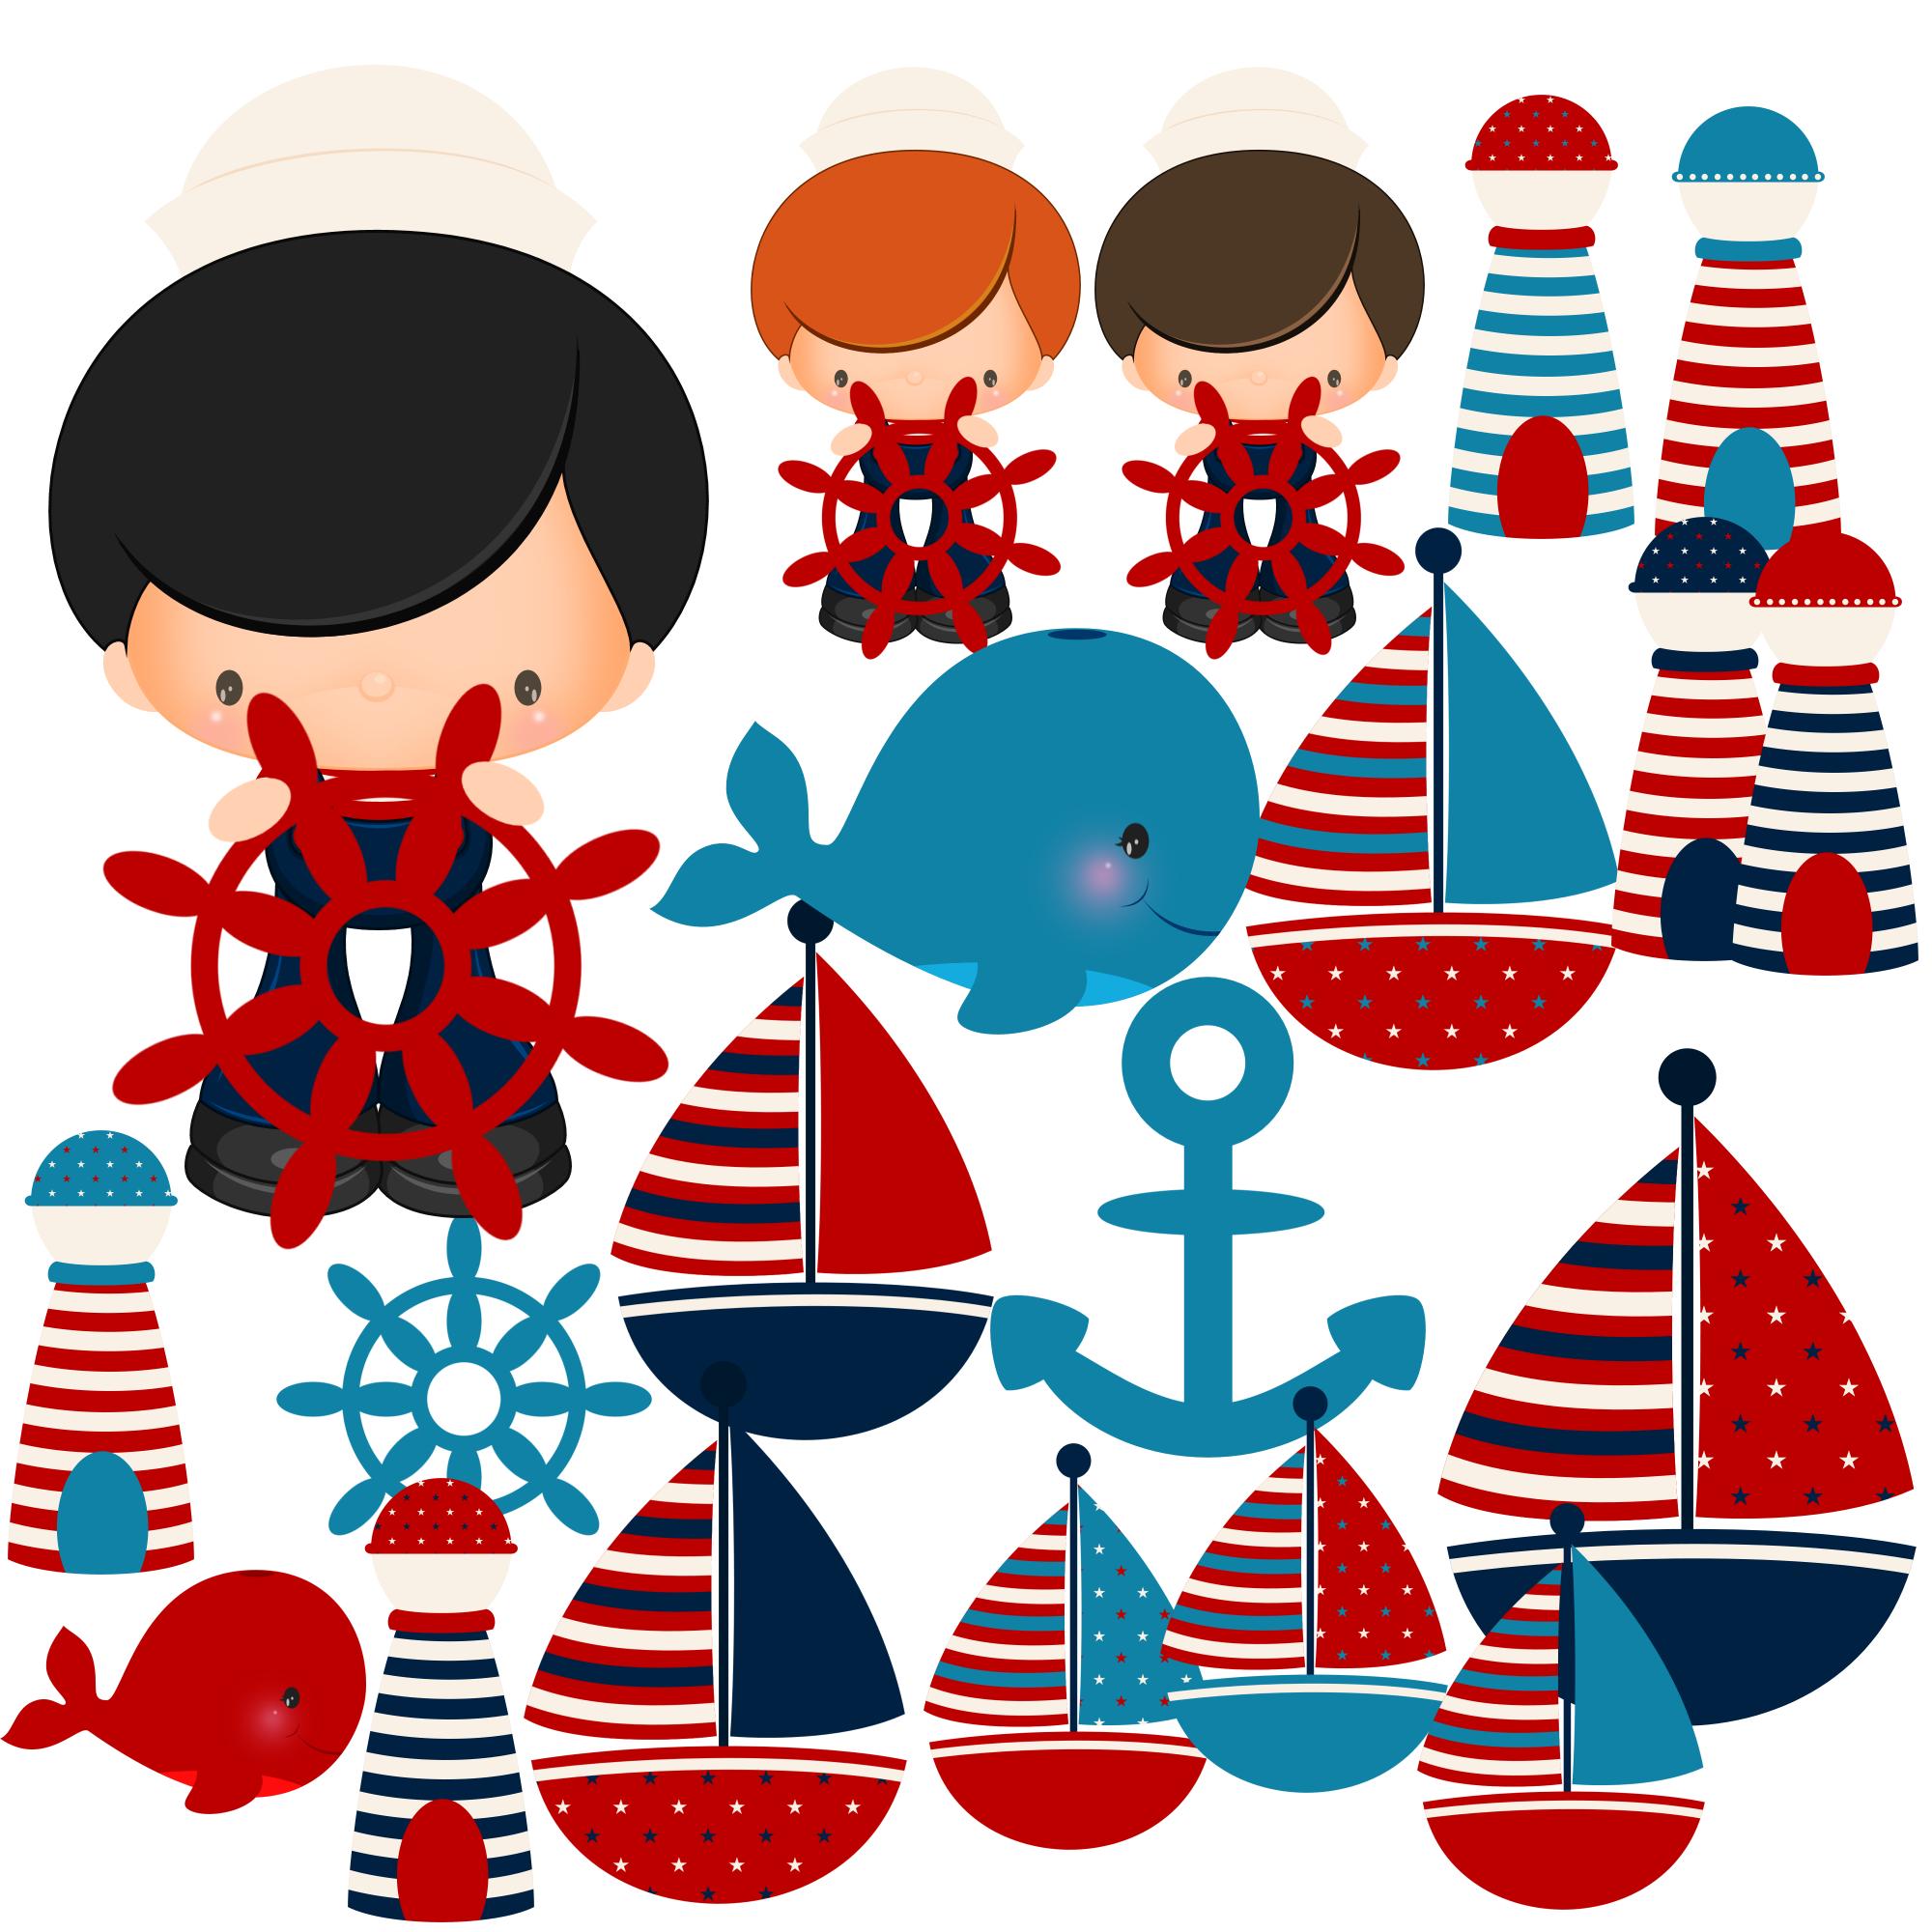 Free PNG Nautical - 74864